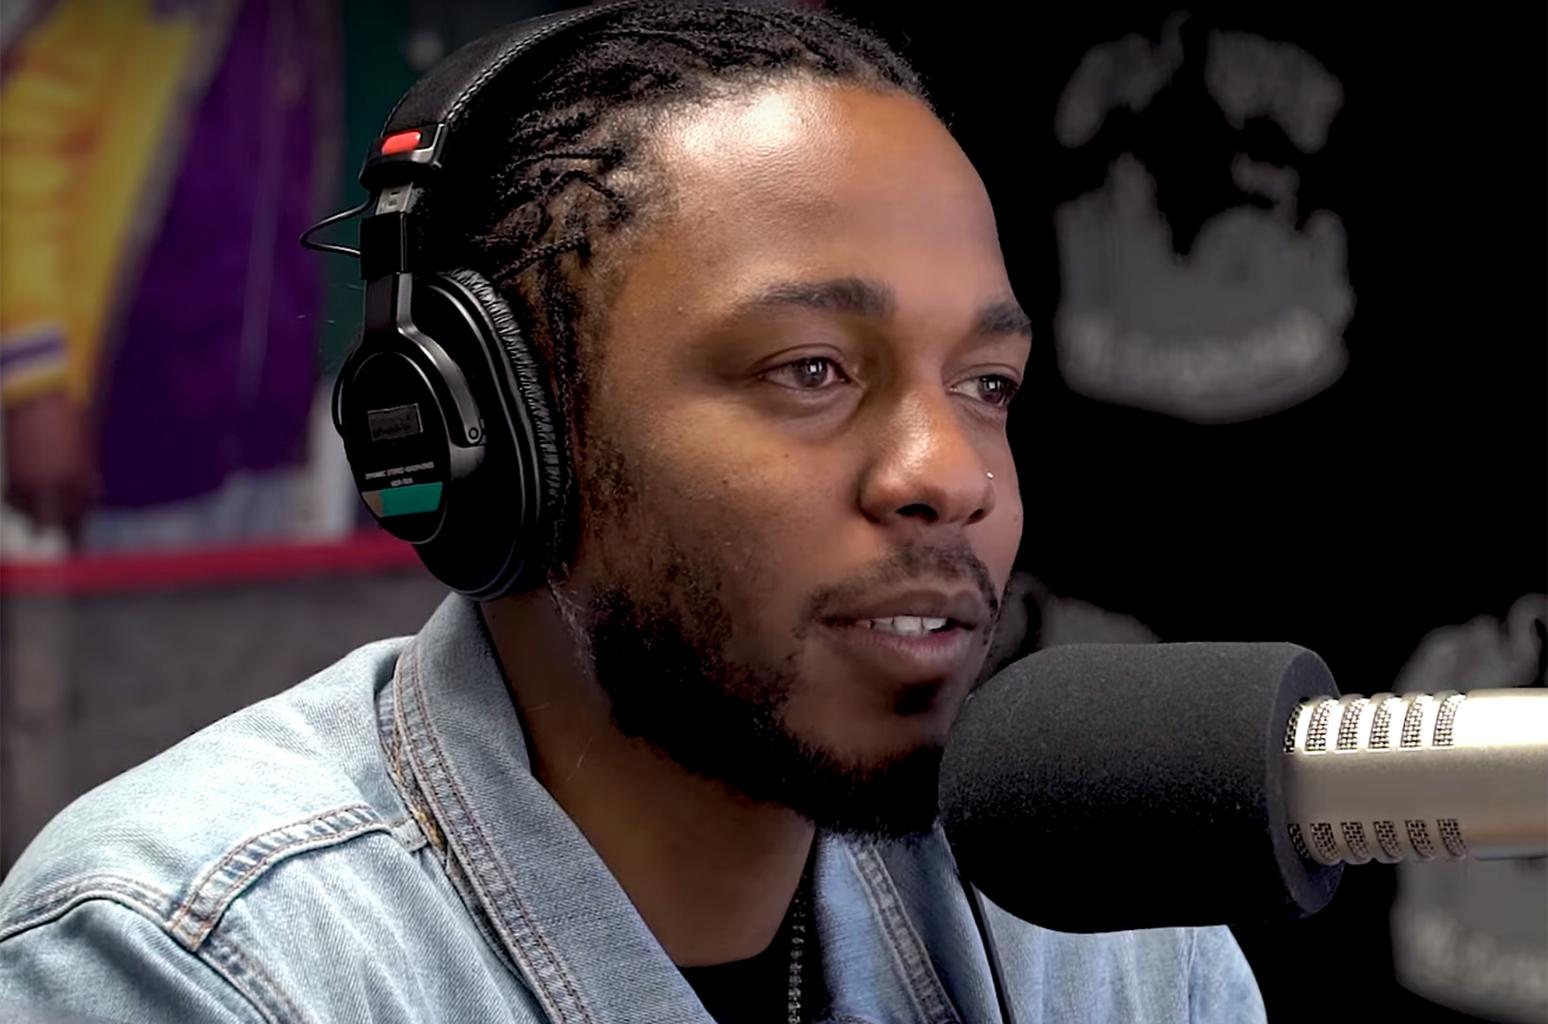 Kendrick Lamar Hopes to Work With Swizz Beatz 'One Day'